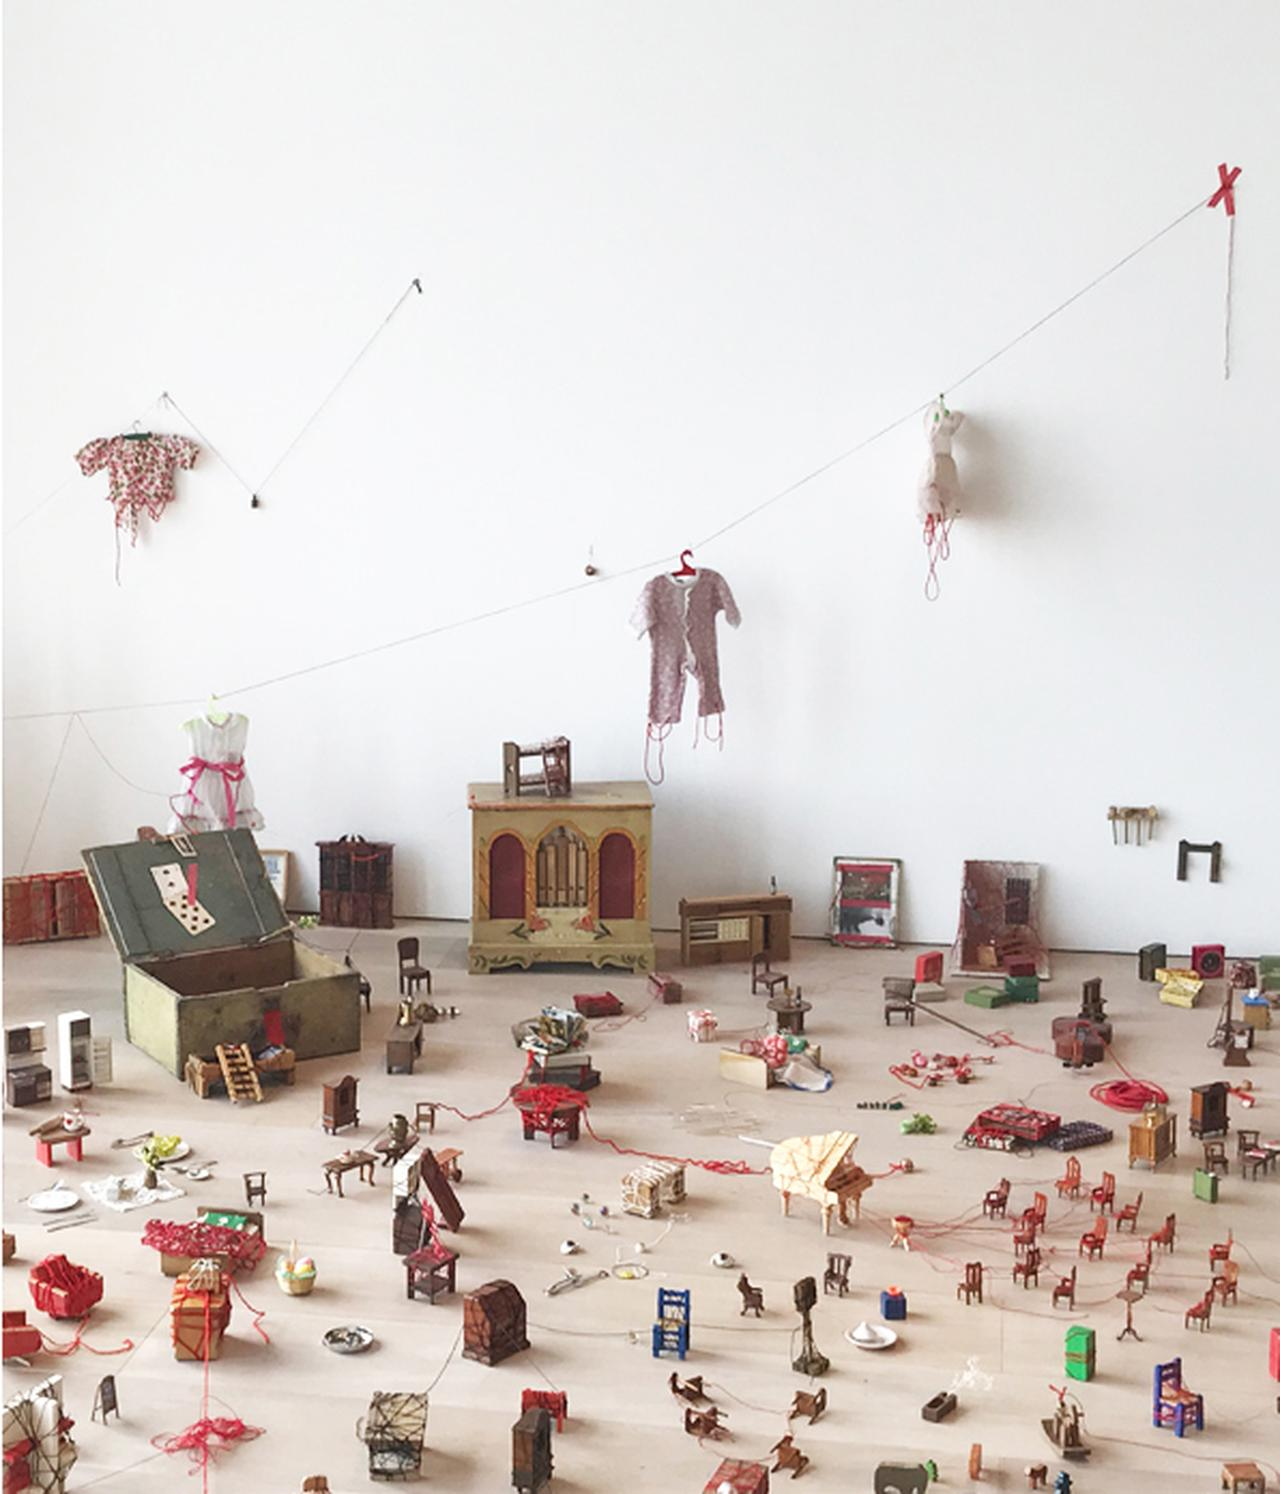 Images : 『塩田千春展:魂がふるえる』|森美術館